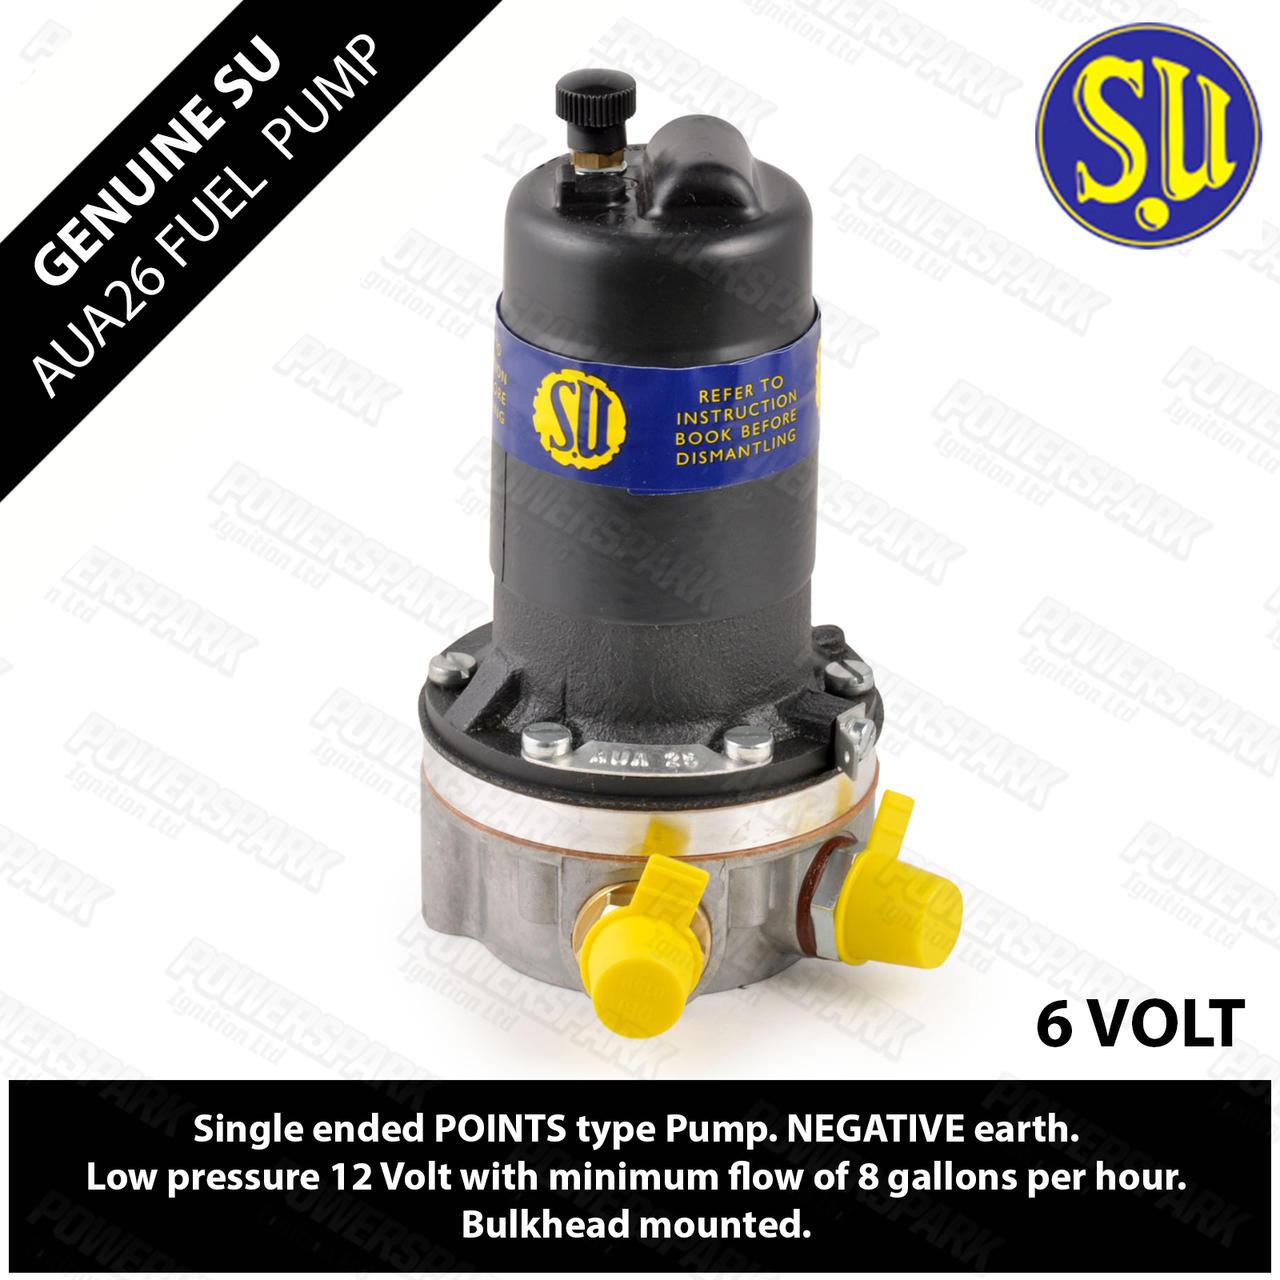 SU Genuine SU AUA26 Electronic Fuel Pump Points - Dual Polarity 6 volt 1.5 psi